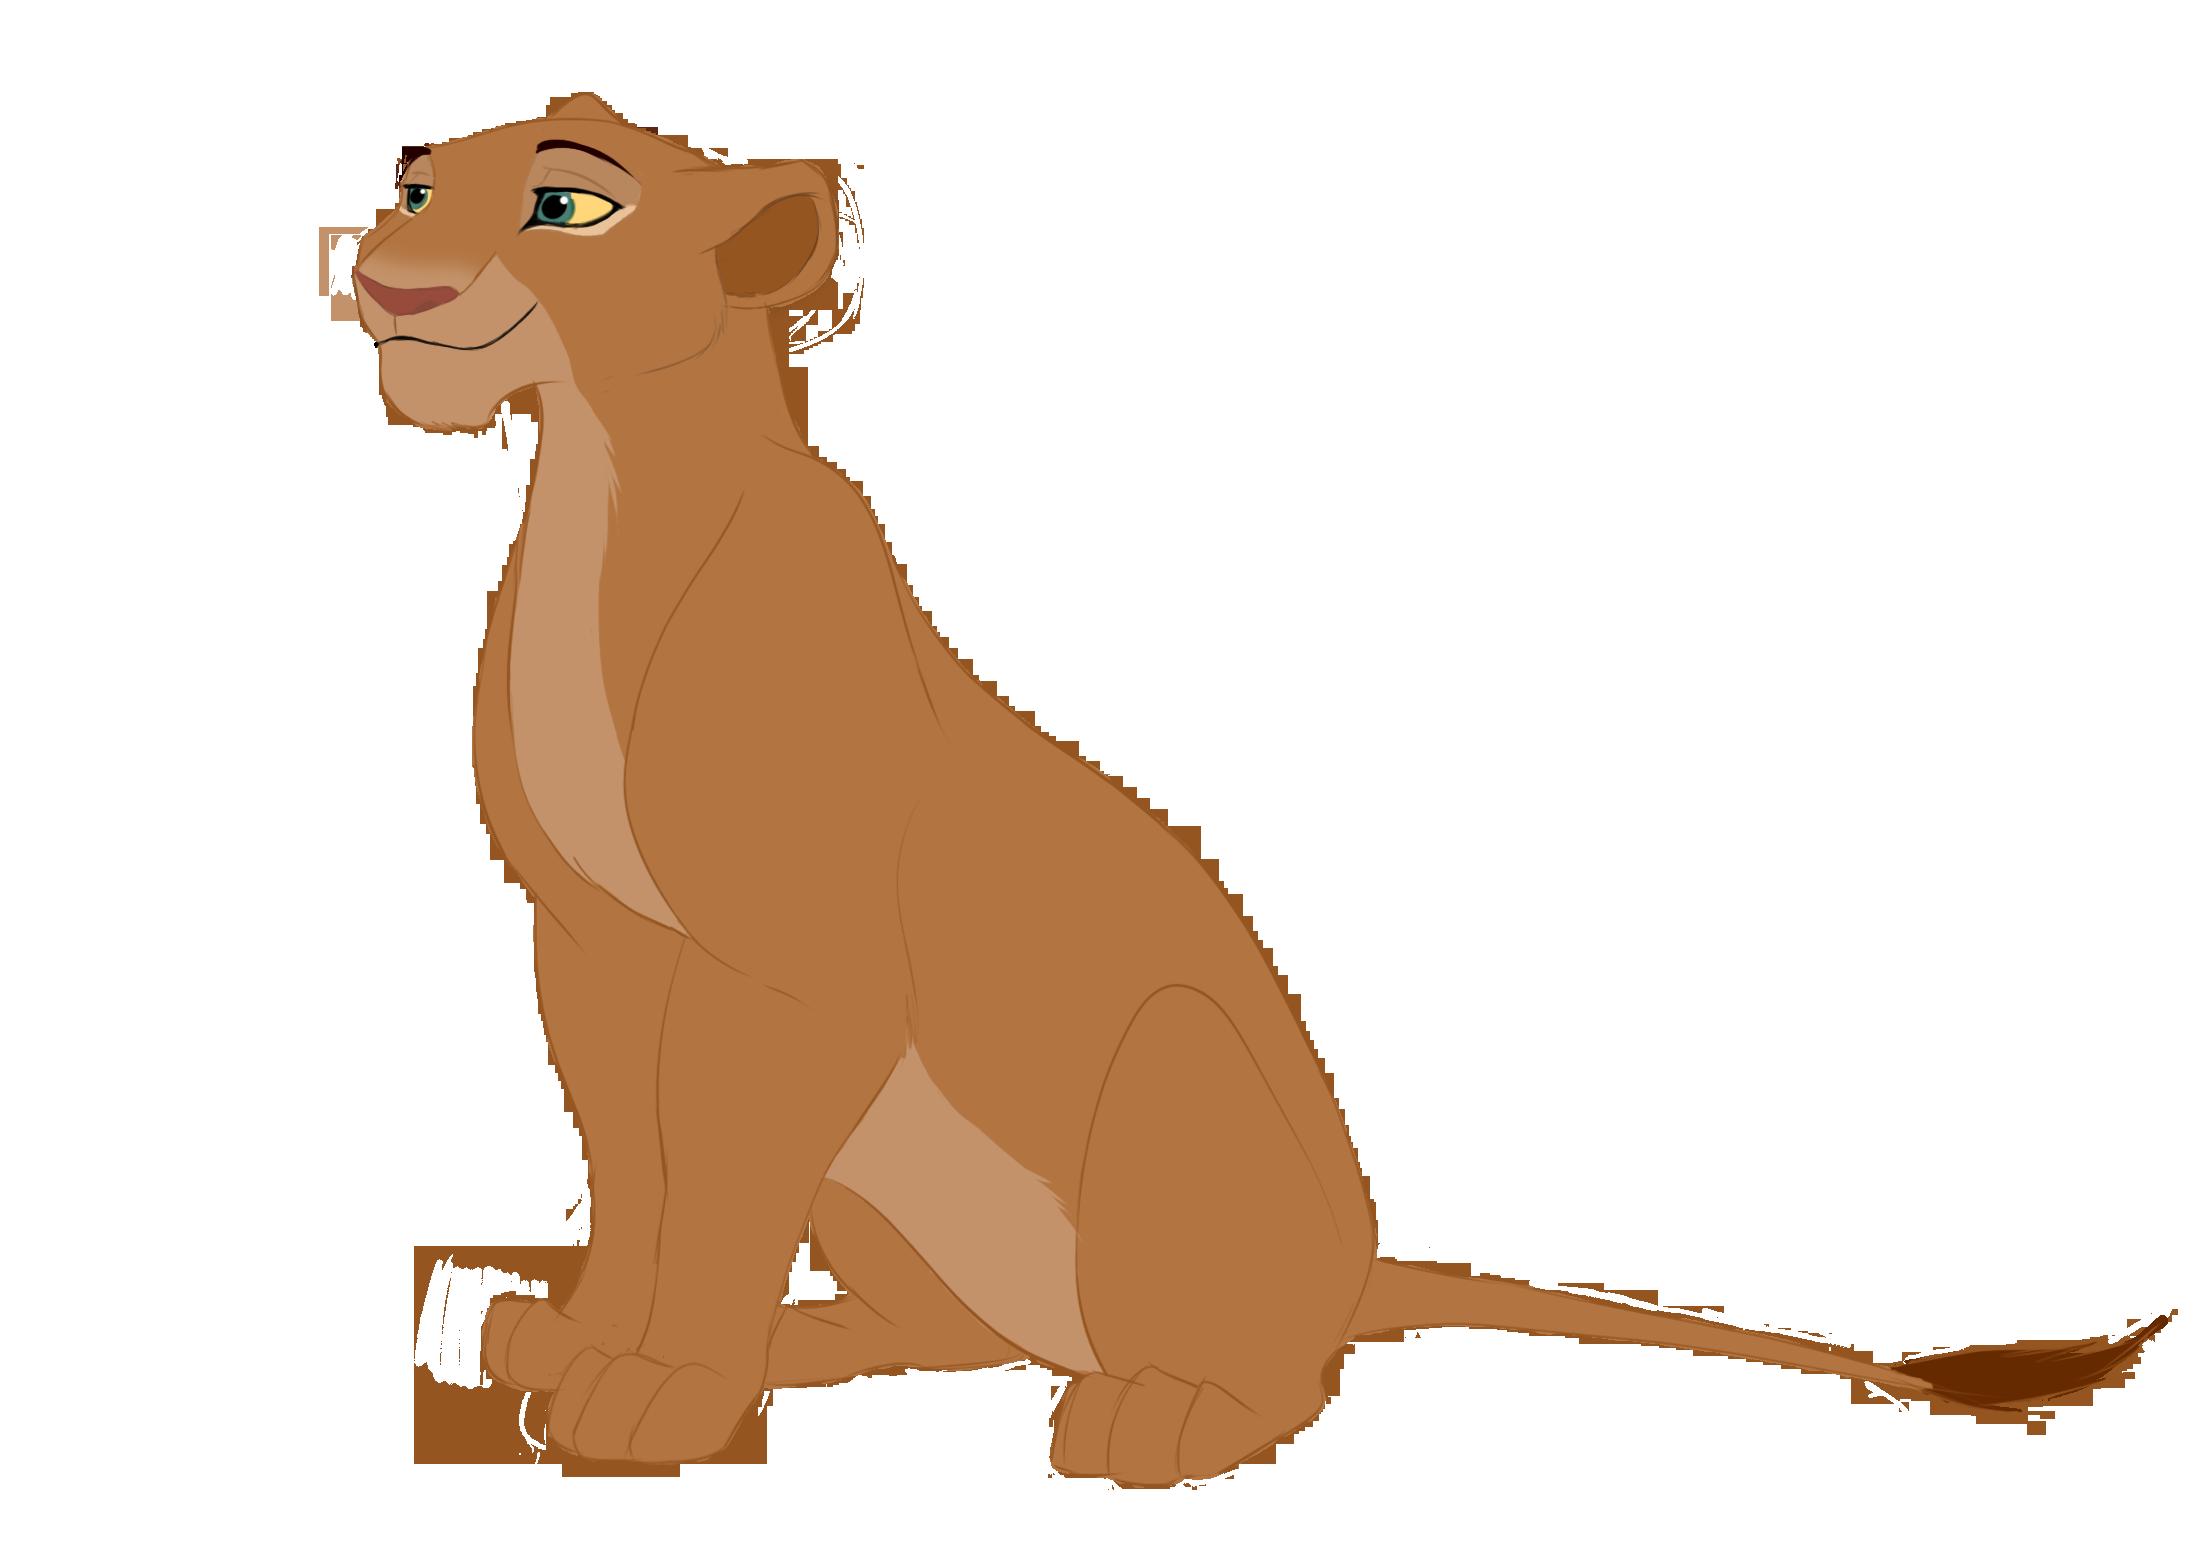 graphic royalty free stock Lostsailor s album fan. Transparent lion lioness